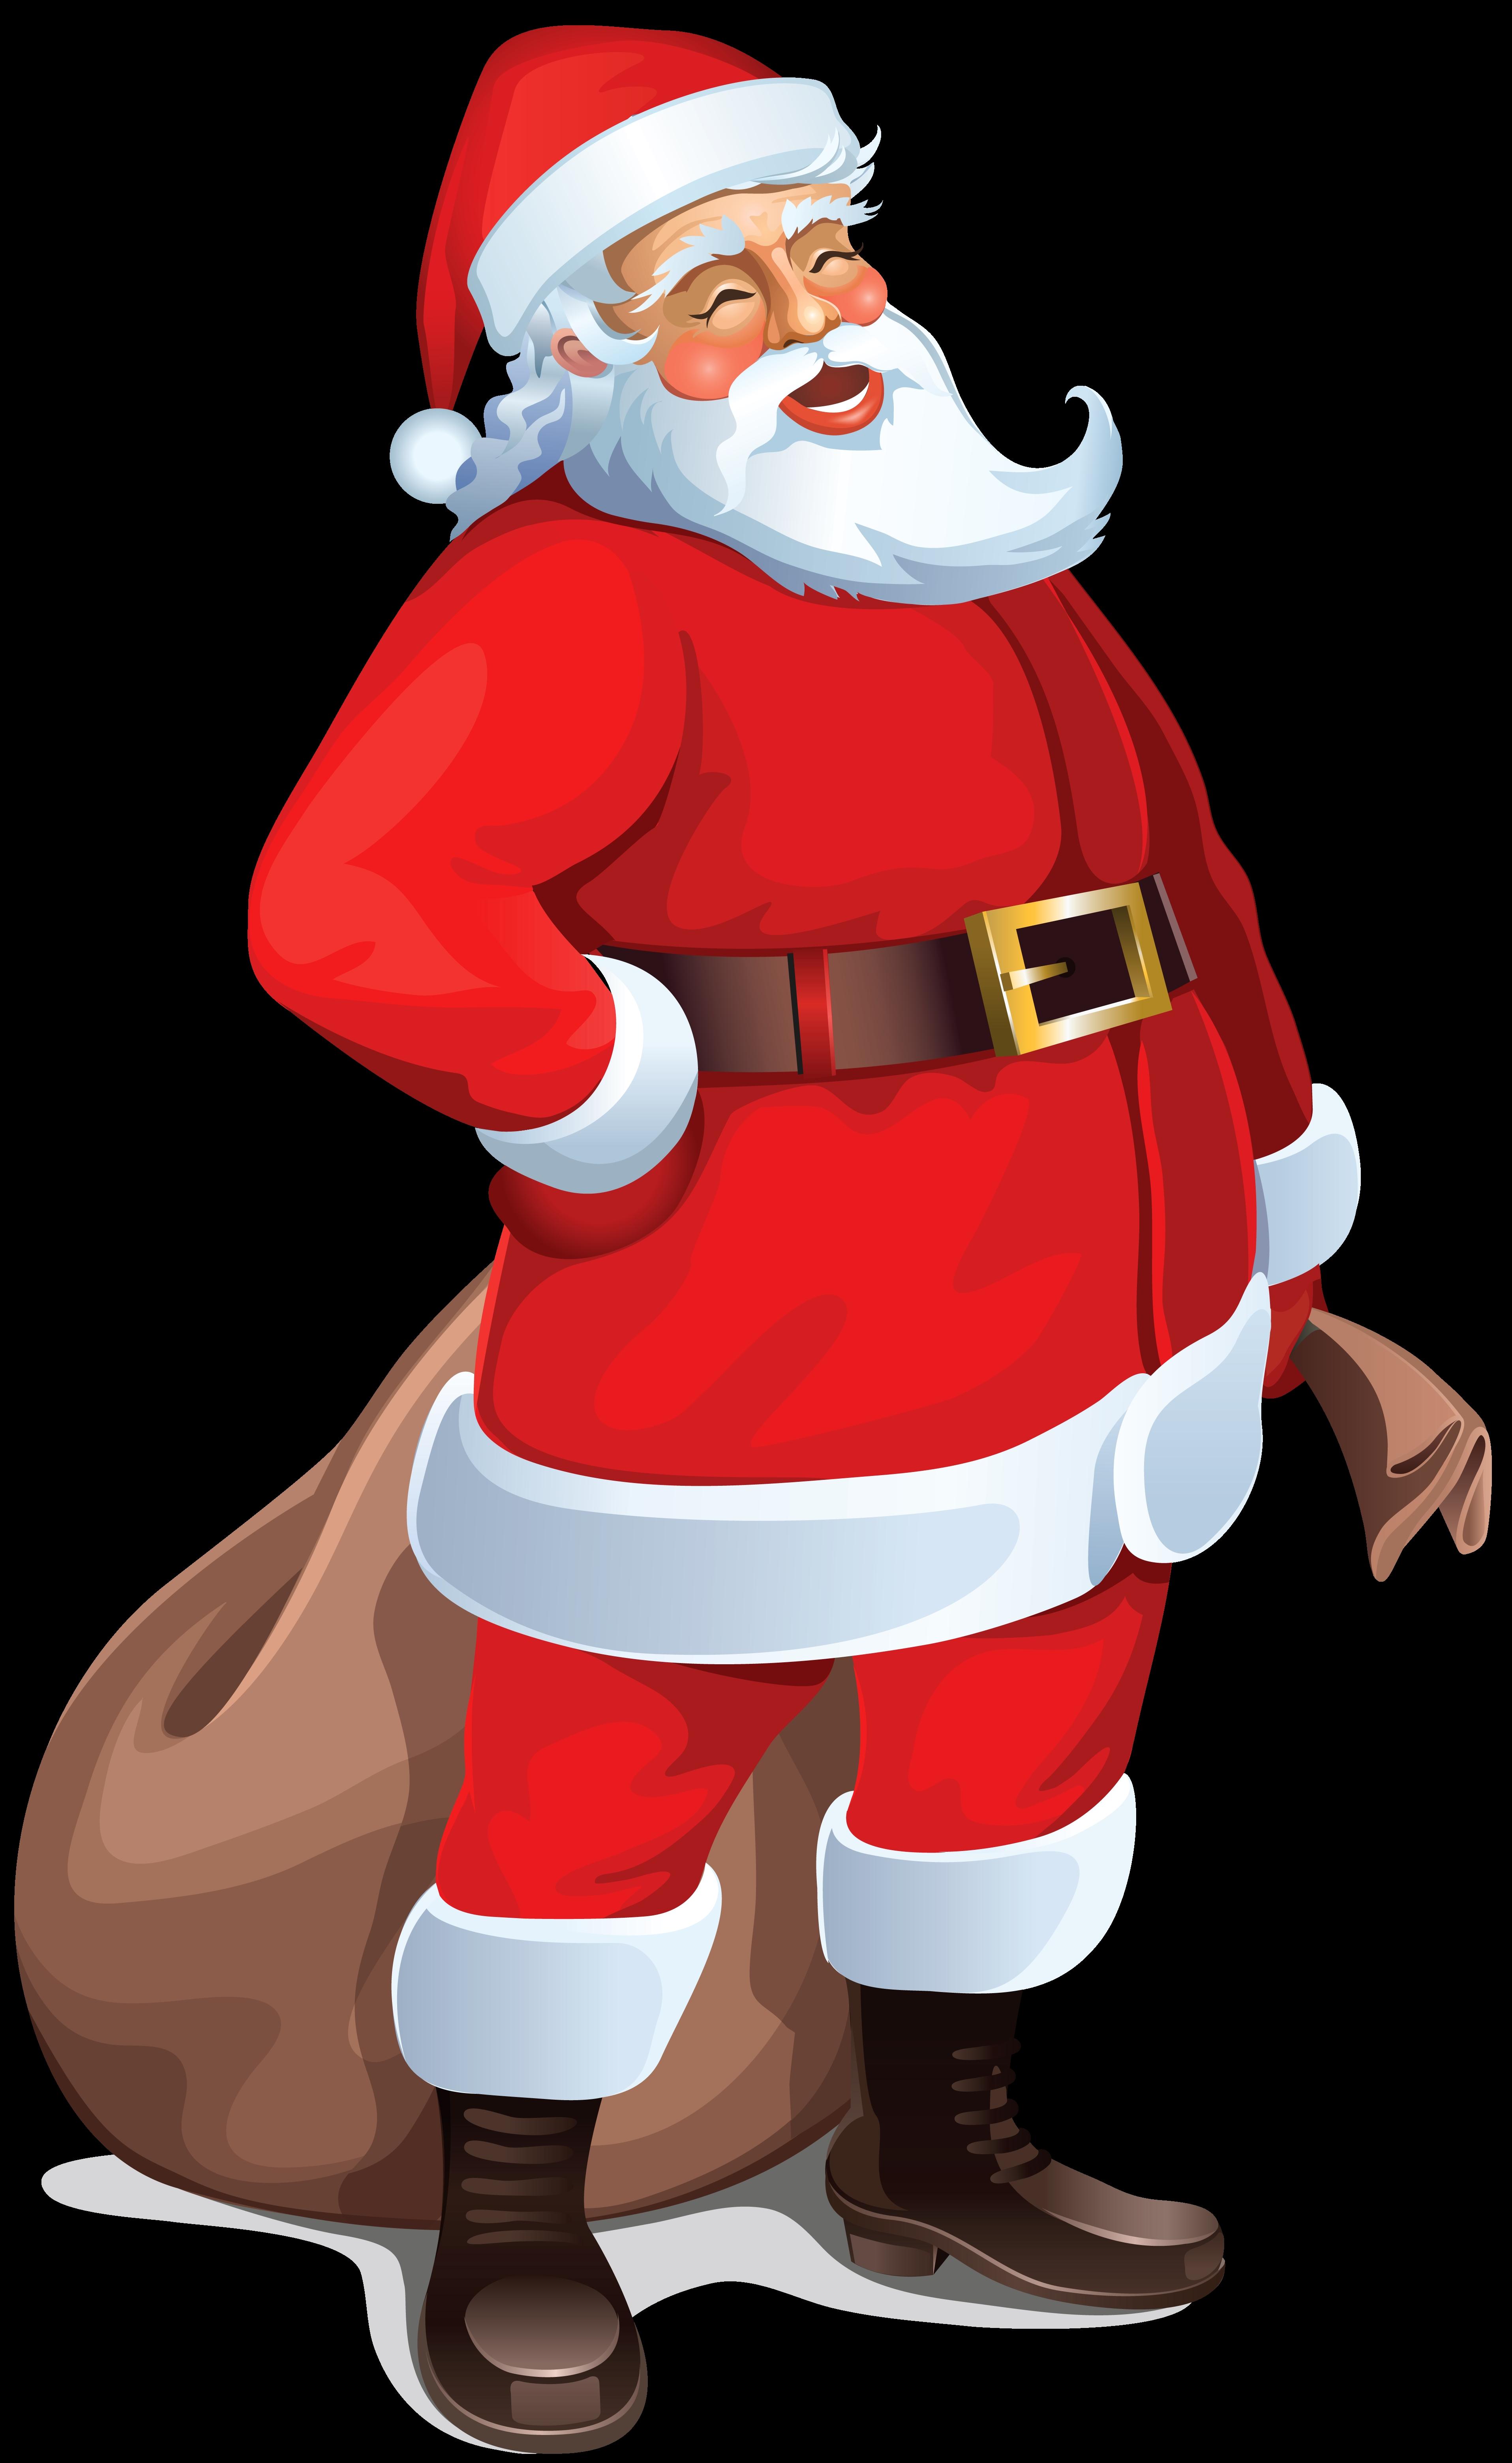 Hawkeye Hd Wallpapers Santa Claus Clipart Hd Image Wallpaper